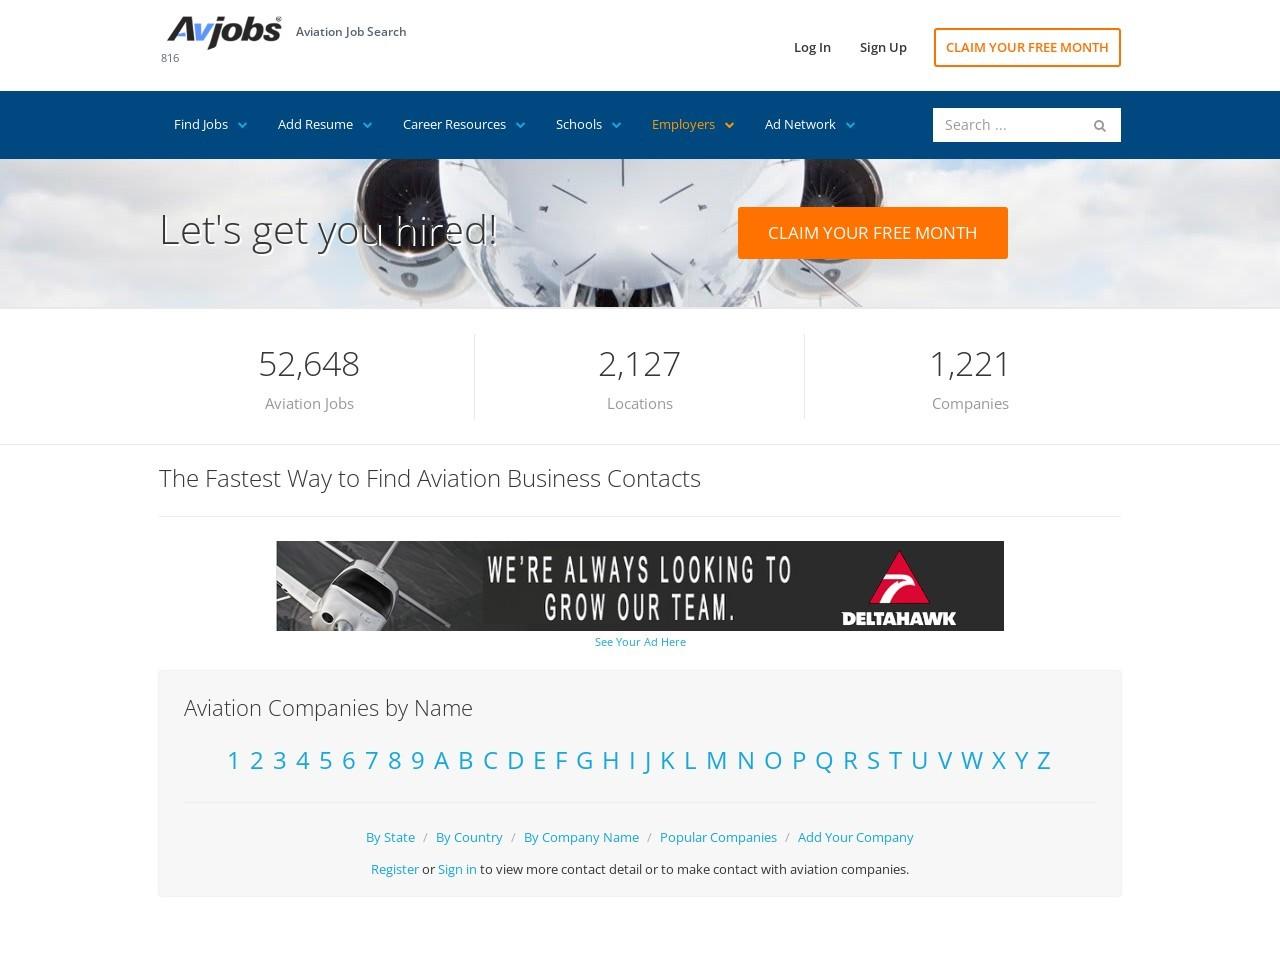 Aviation Resource Management Oakland NJ United States